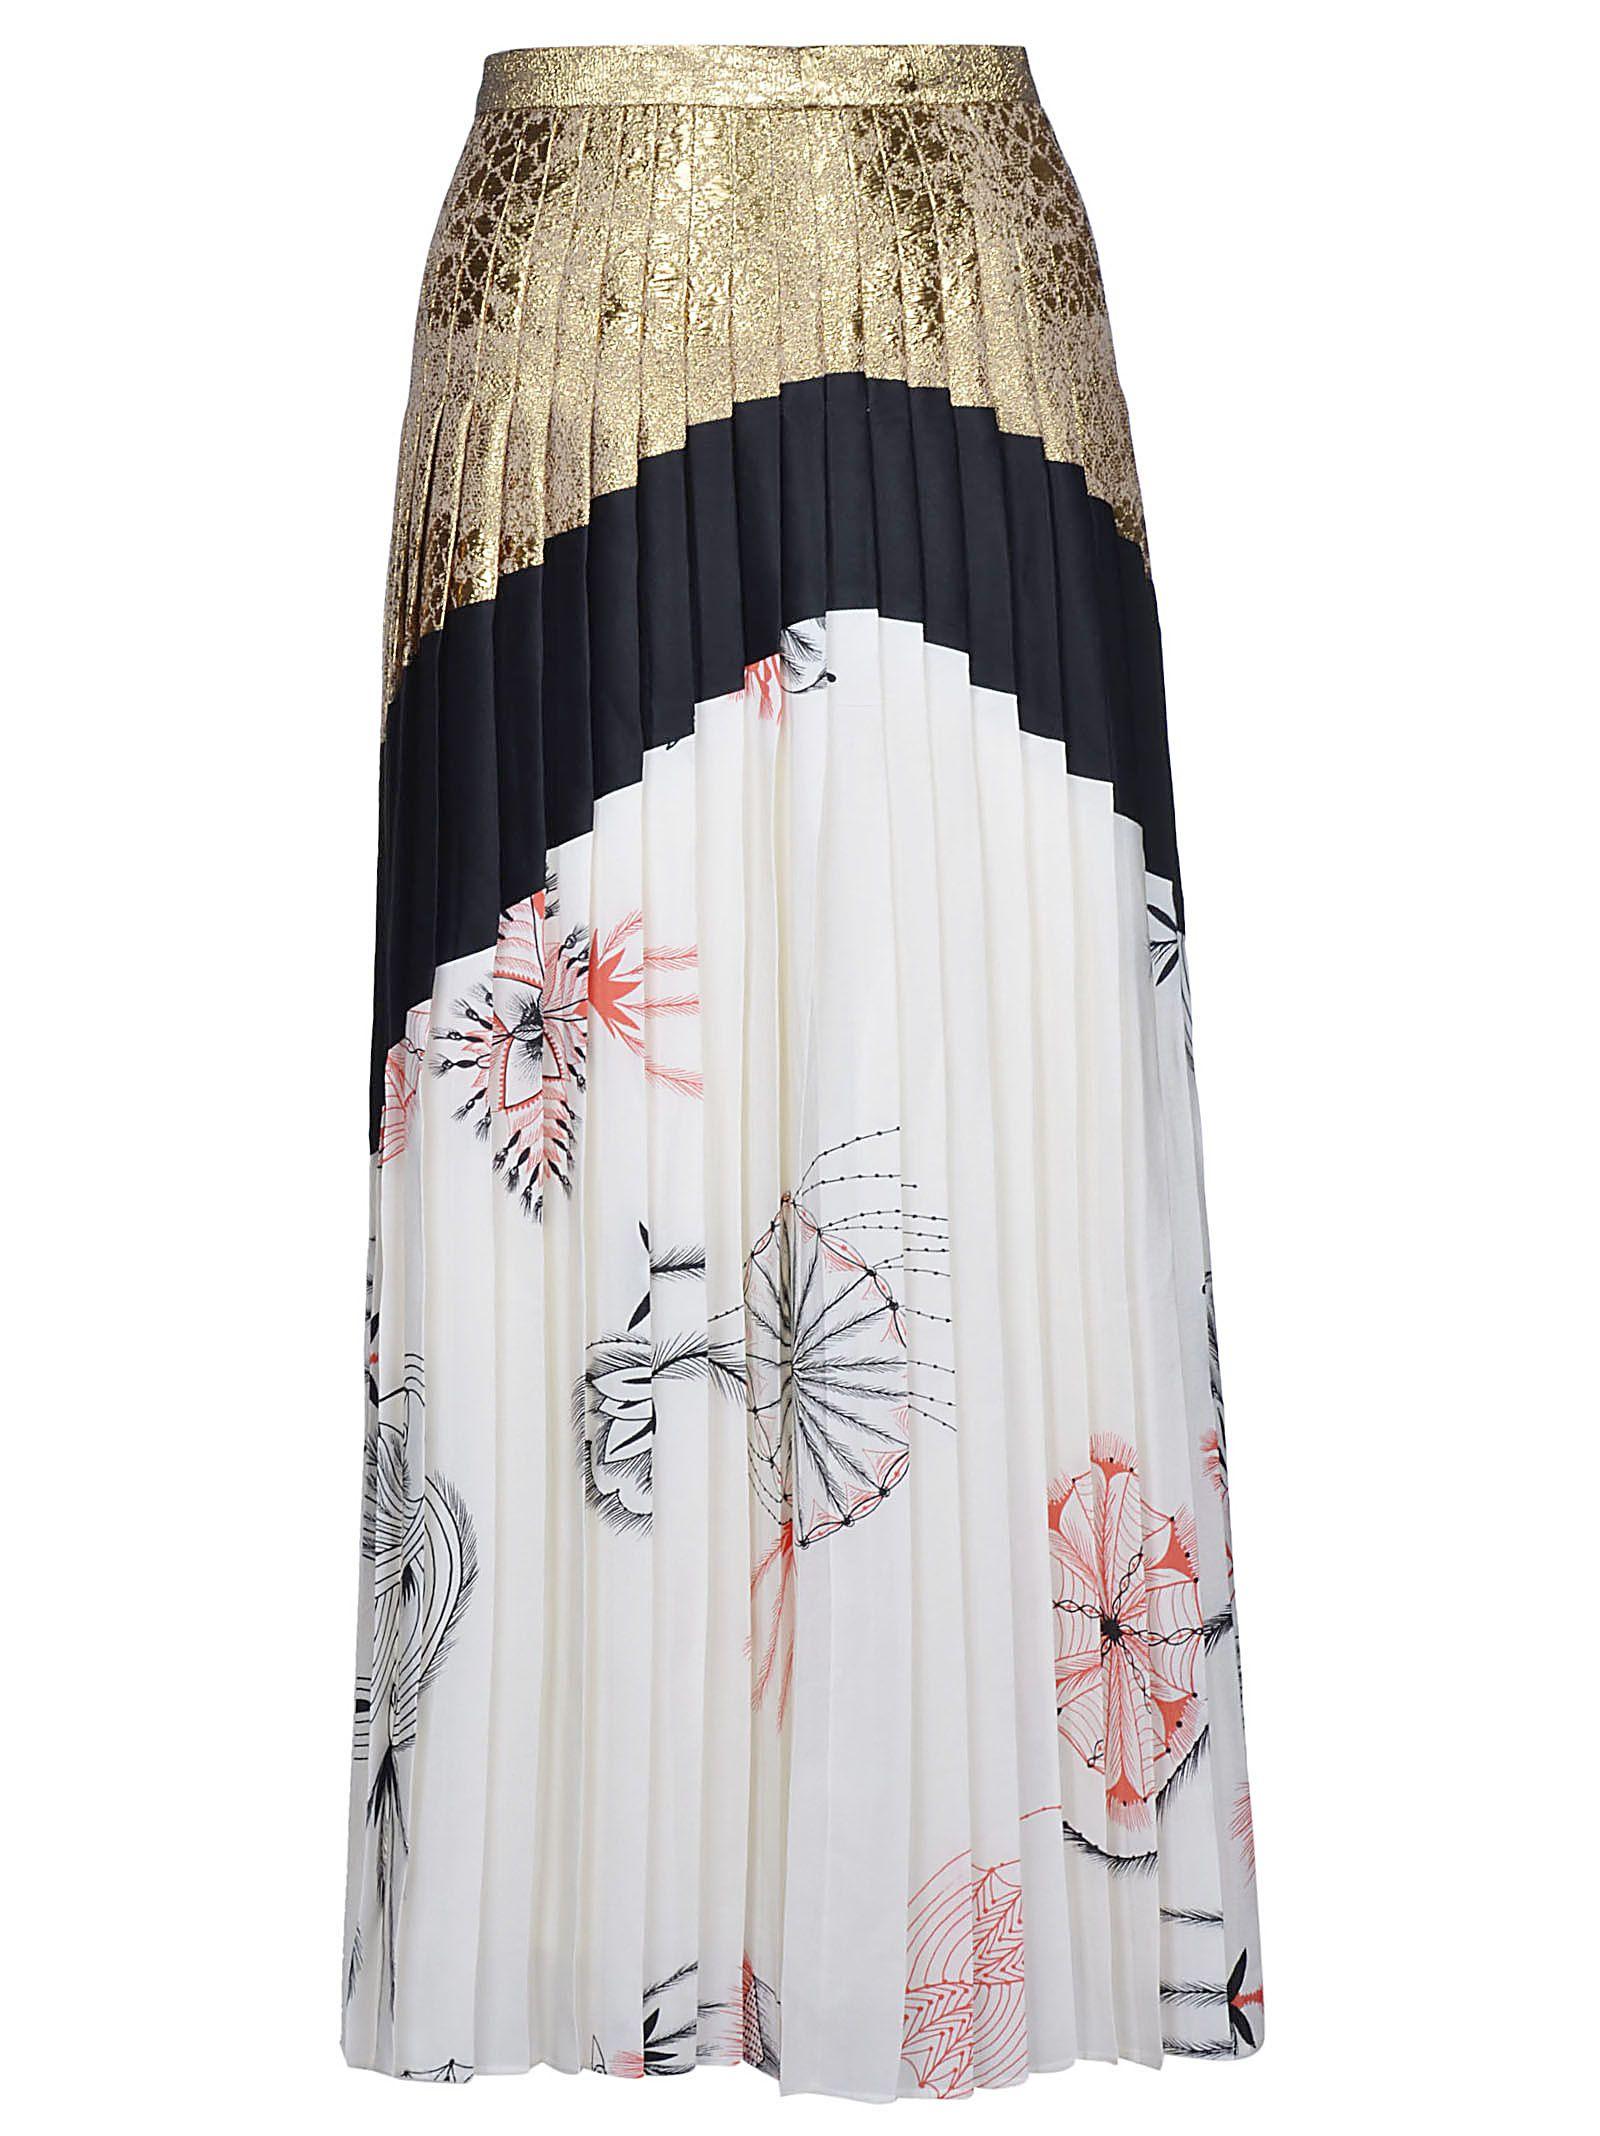 Dries Van Noten Tri-color Pleated Long Skirt